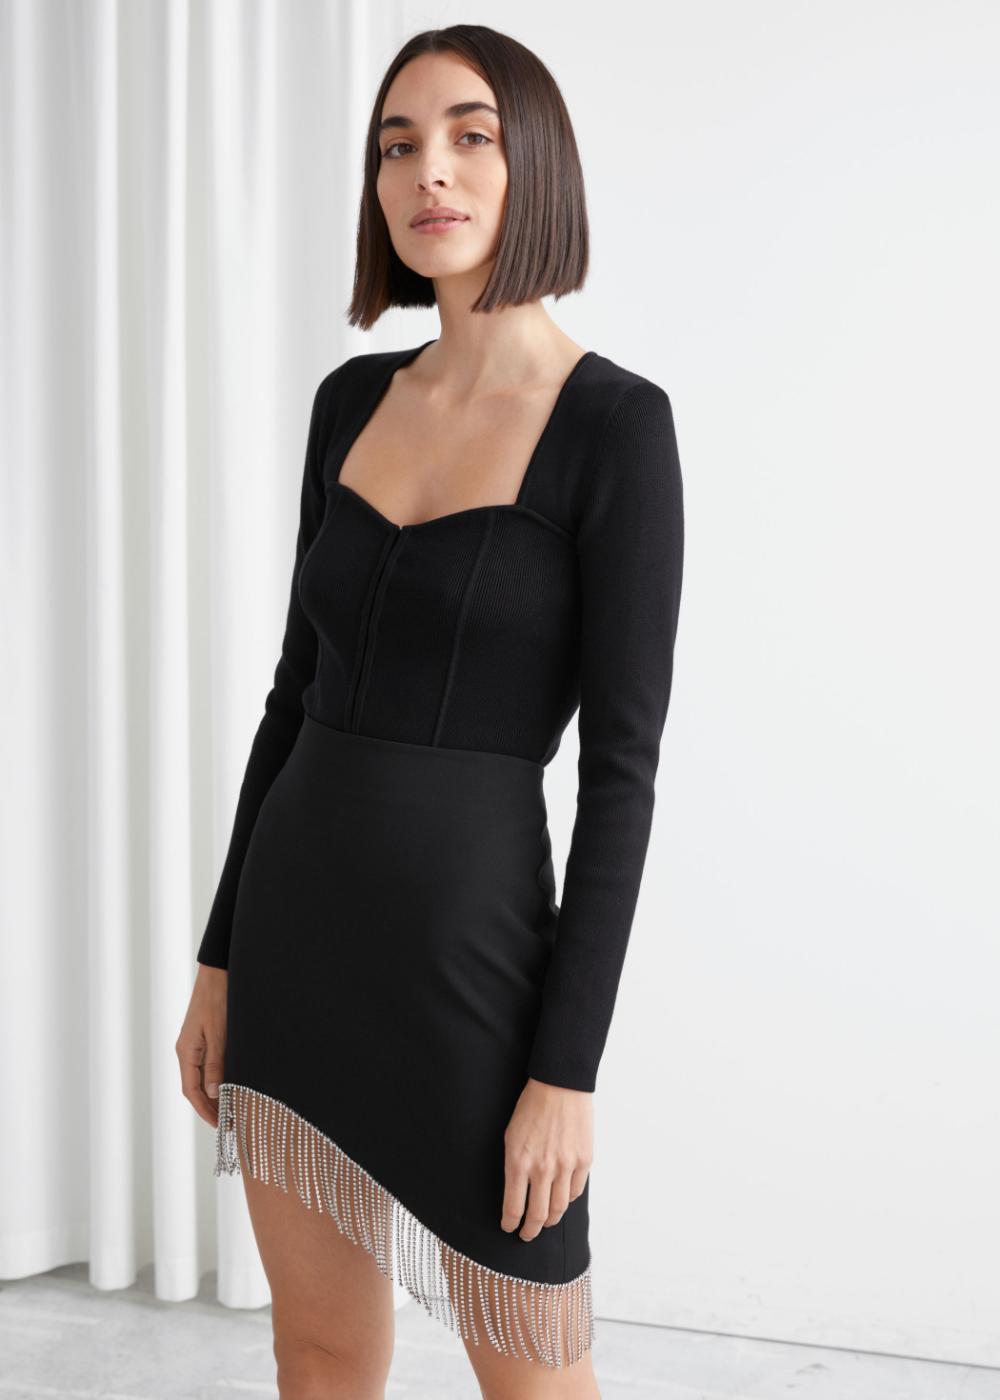 Black 2 In 1 Strappy Split Front Shift Dress 1000 Shift Dress Basic Black Dress Fashion [ 1180 x 740 Pixel ]